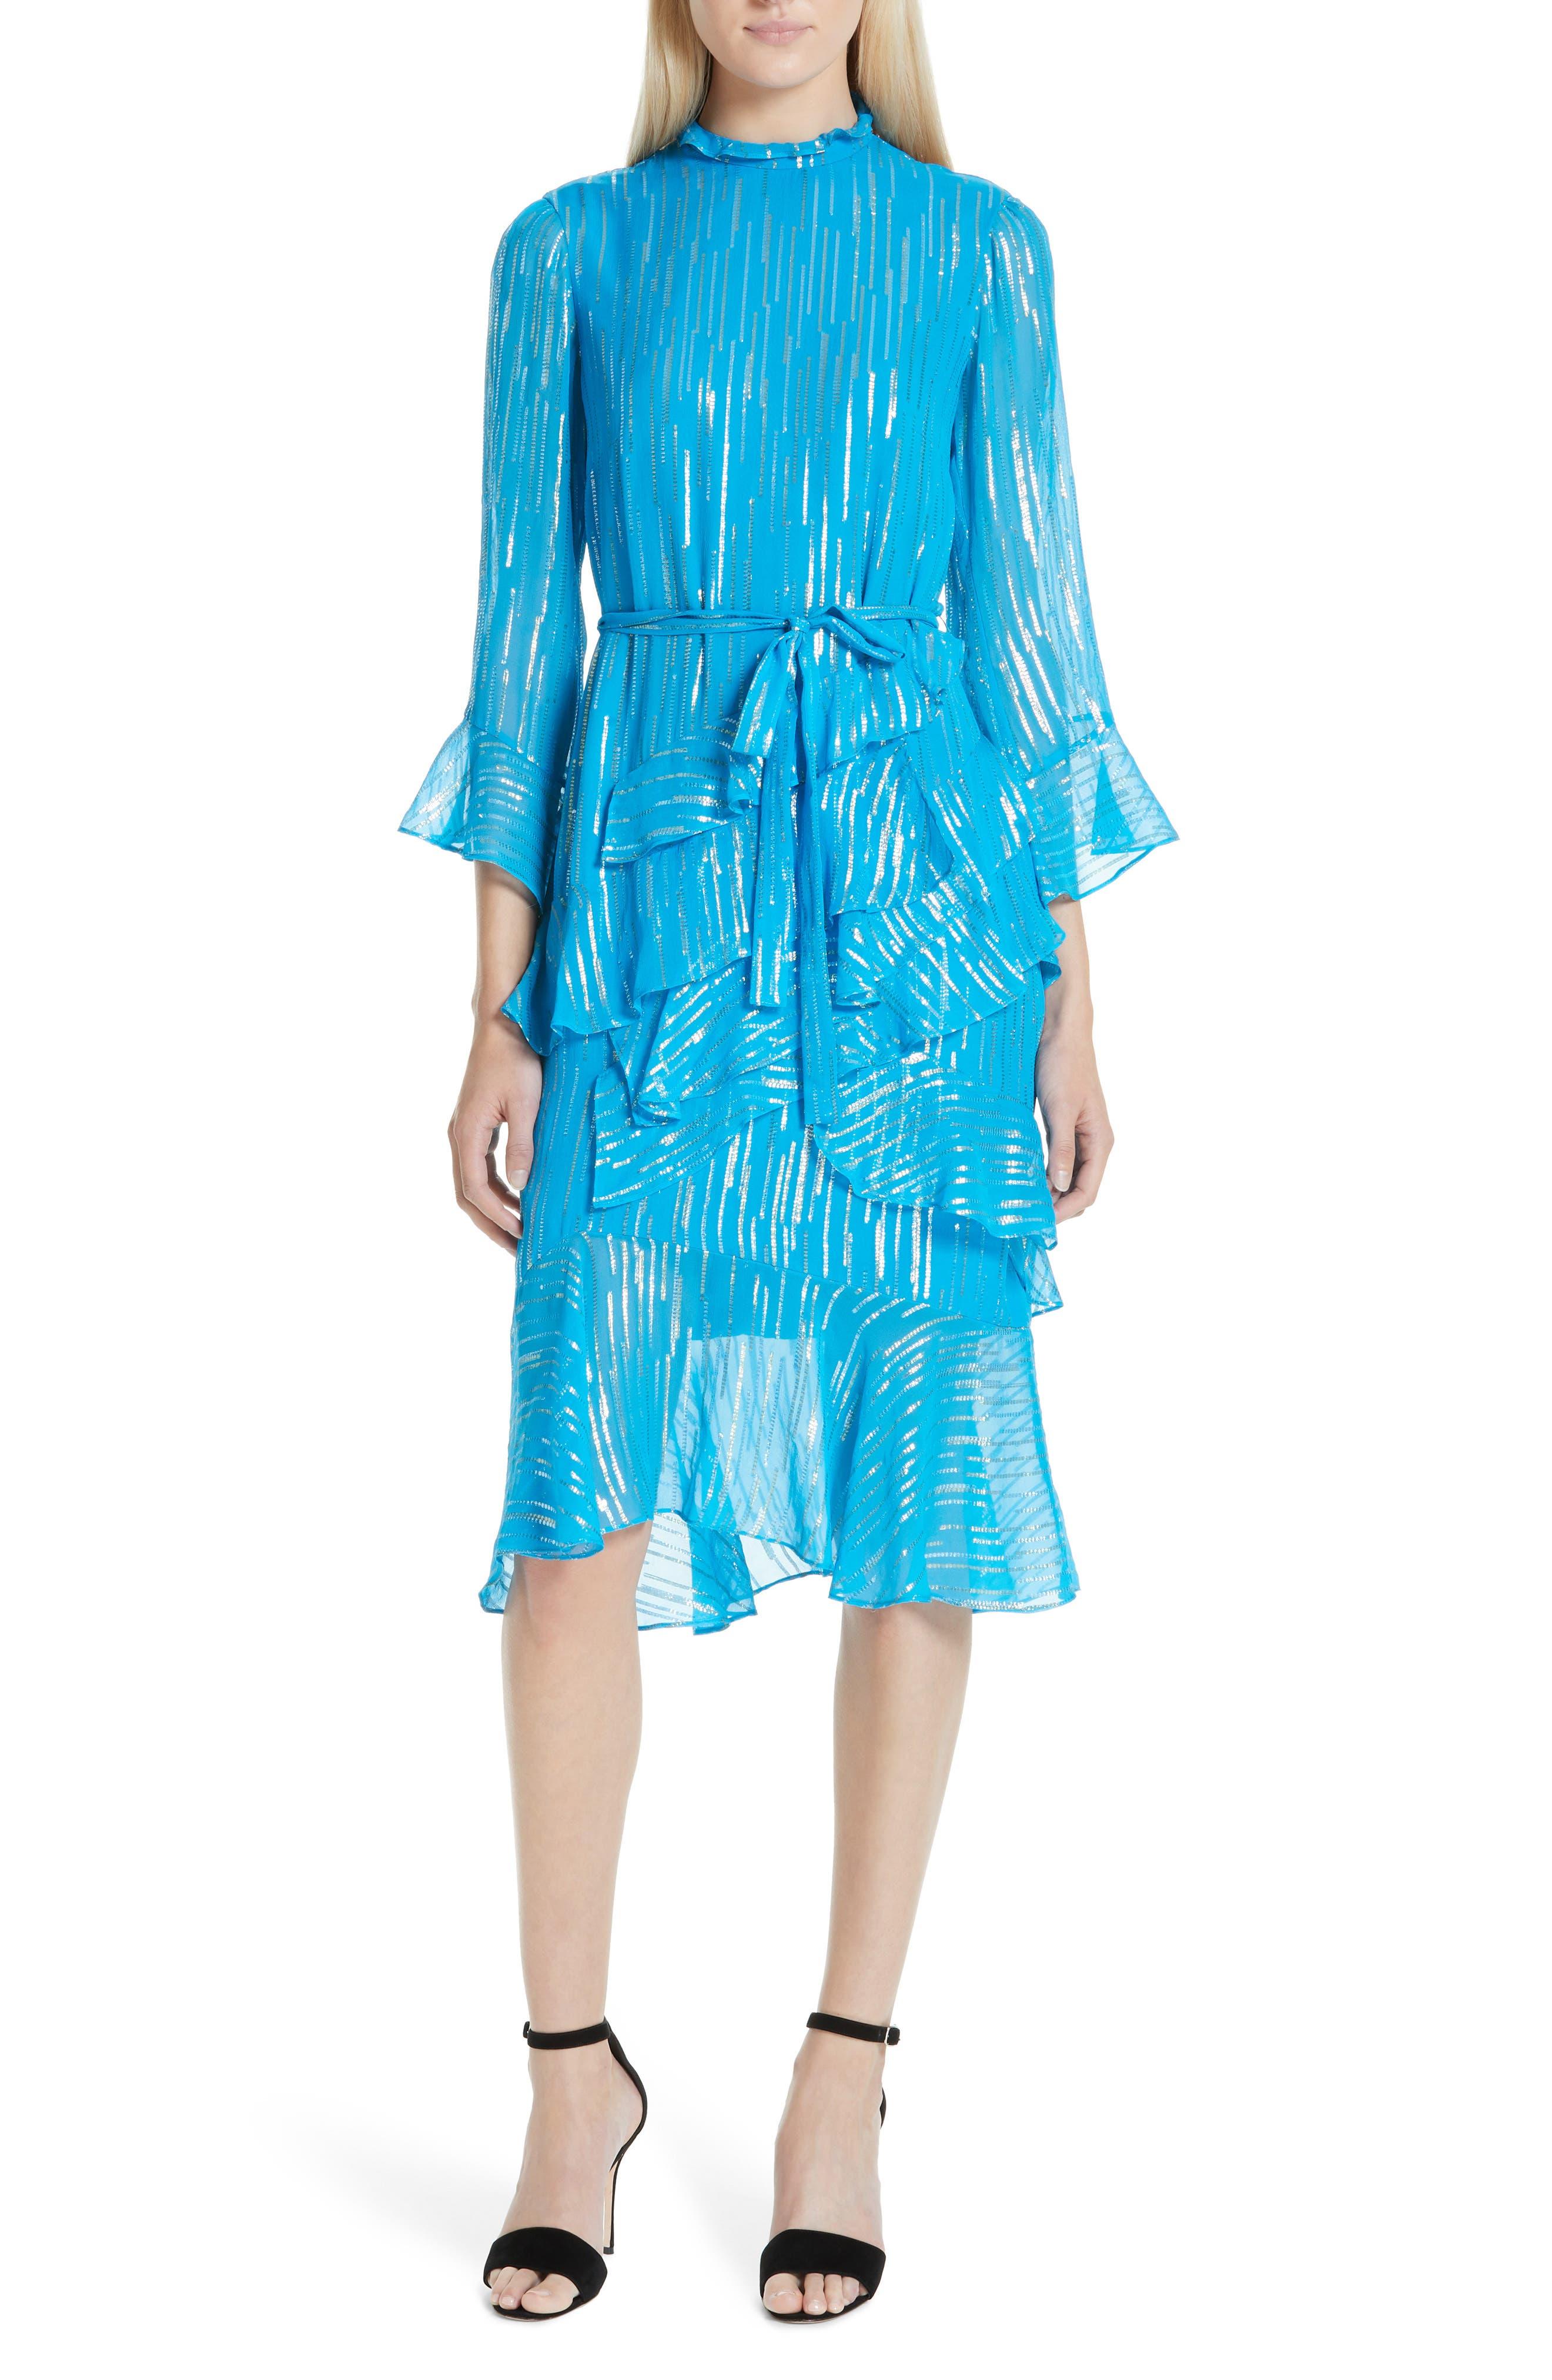 SALONI, Marissa Metallic Ruffle Dress, Main thumbnail 1, color, TURQUOISE/ METALLIC